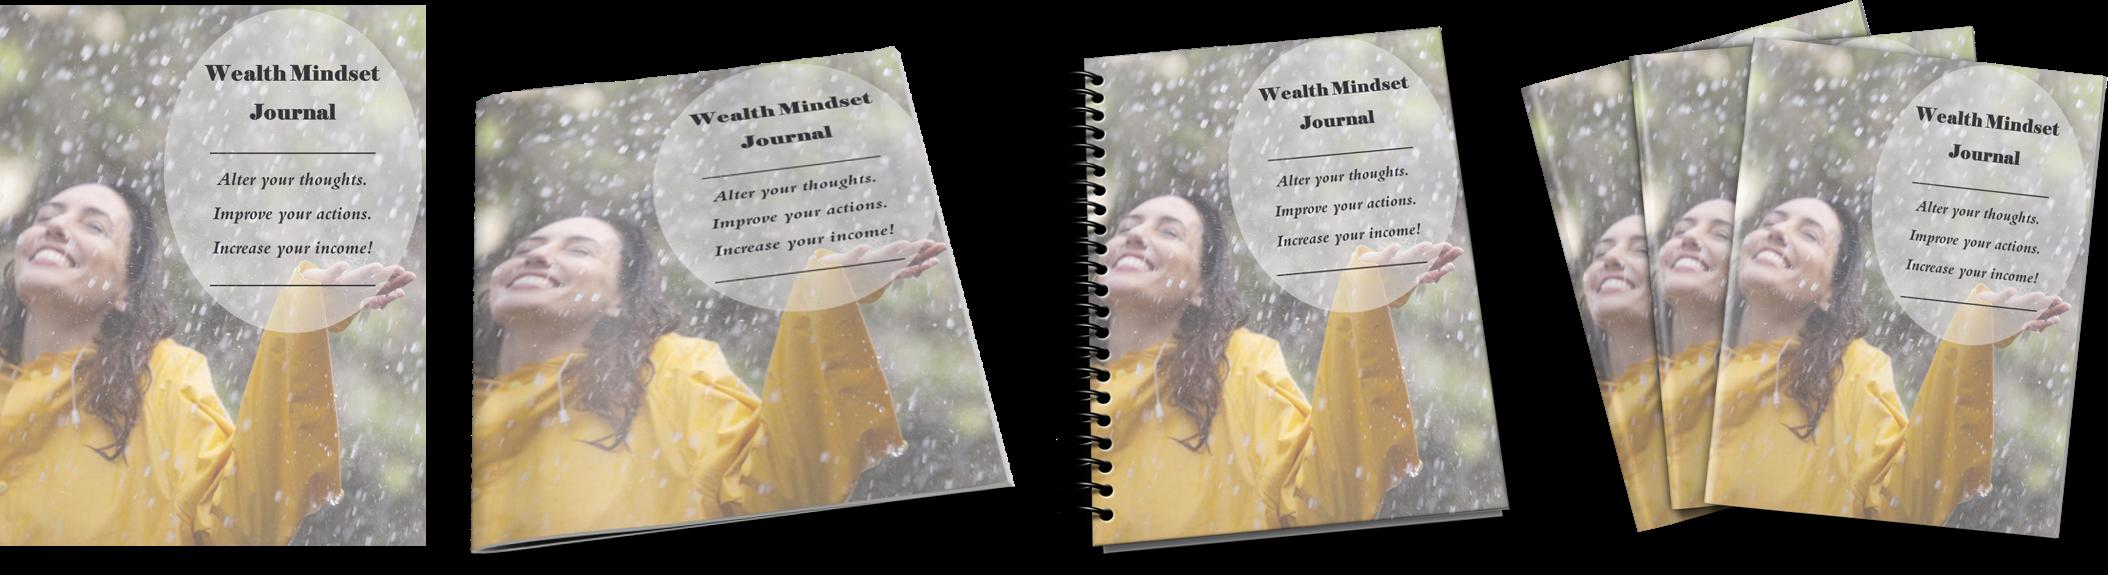 4 wealth mindset ecovers